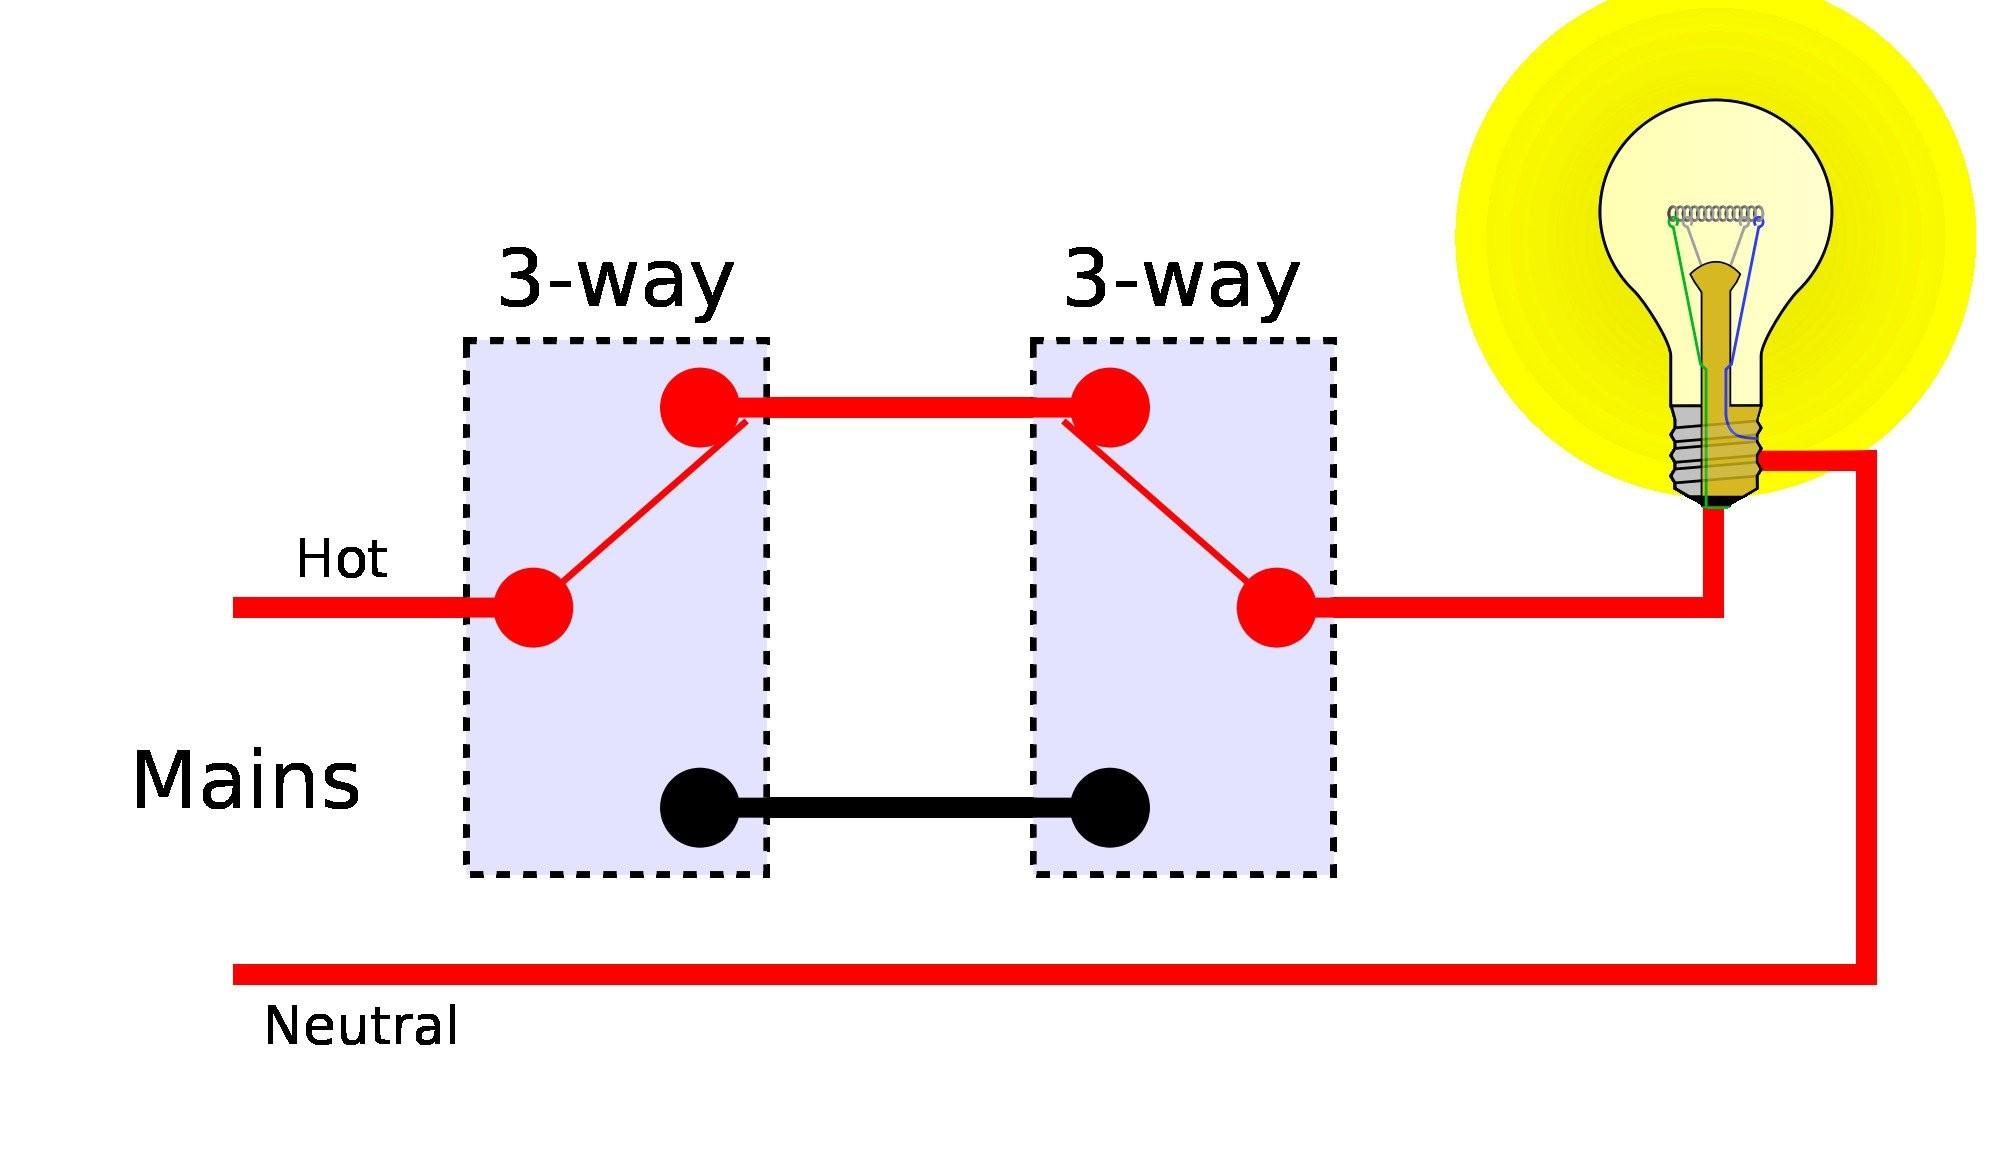 3 Way Circuit Diagram Inspirational Wiring Diagram 3 Way Light Switch Gang 2 Amazing Two Afif